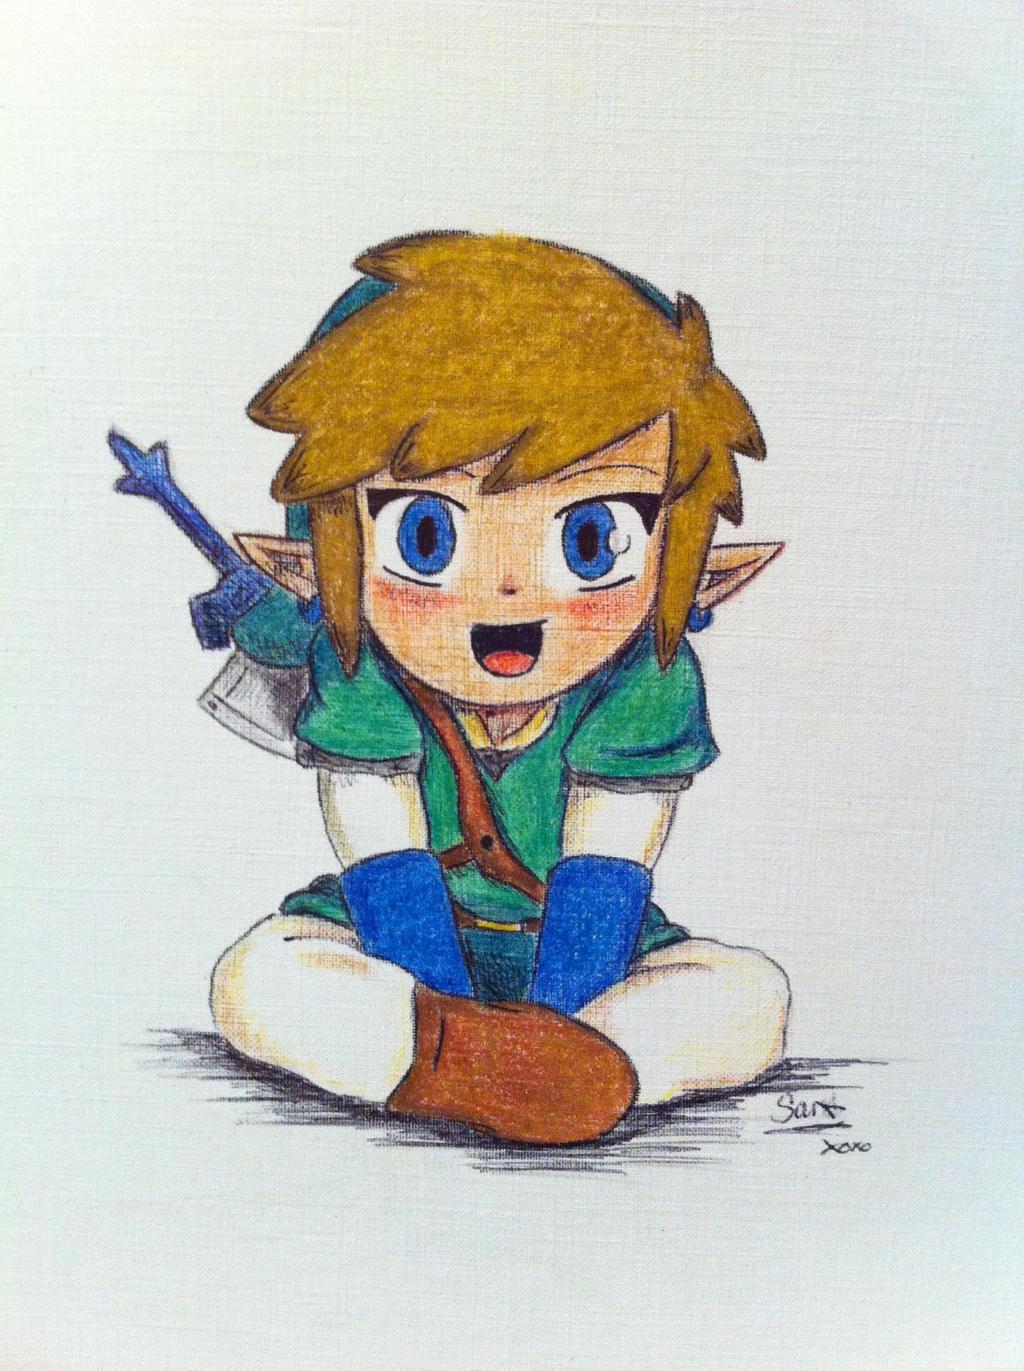 Link Chibi (Skyward Sword) by Alibax-Sombre